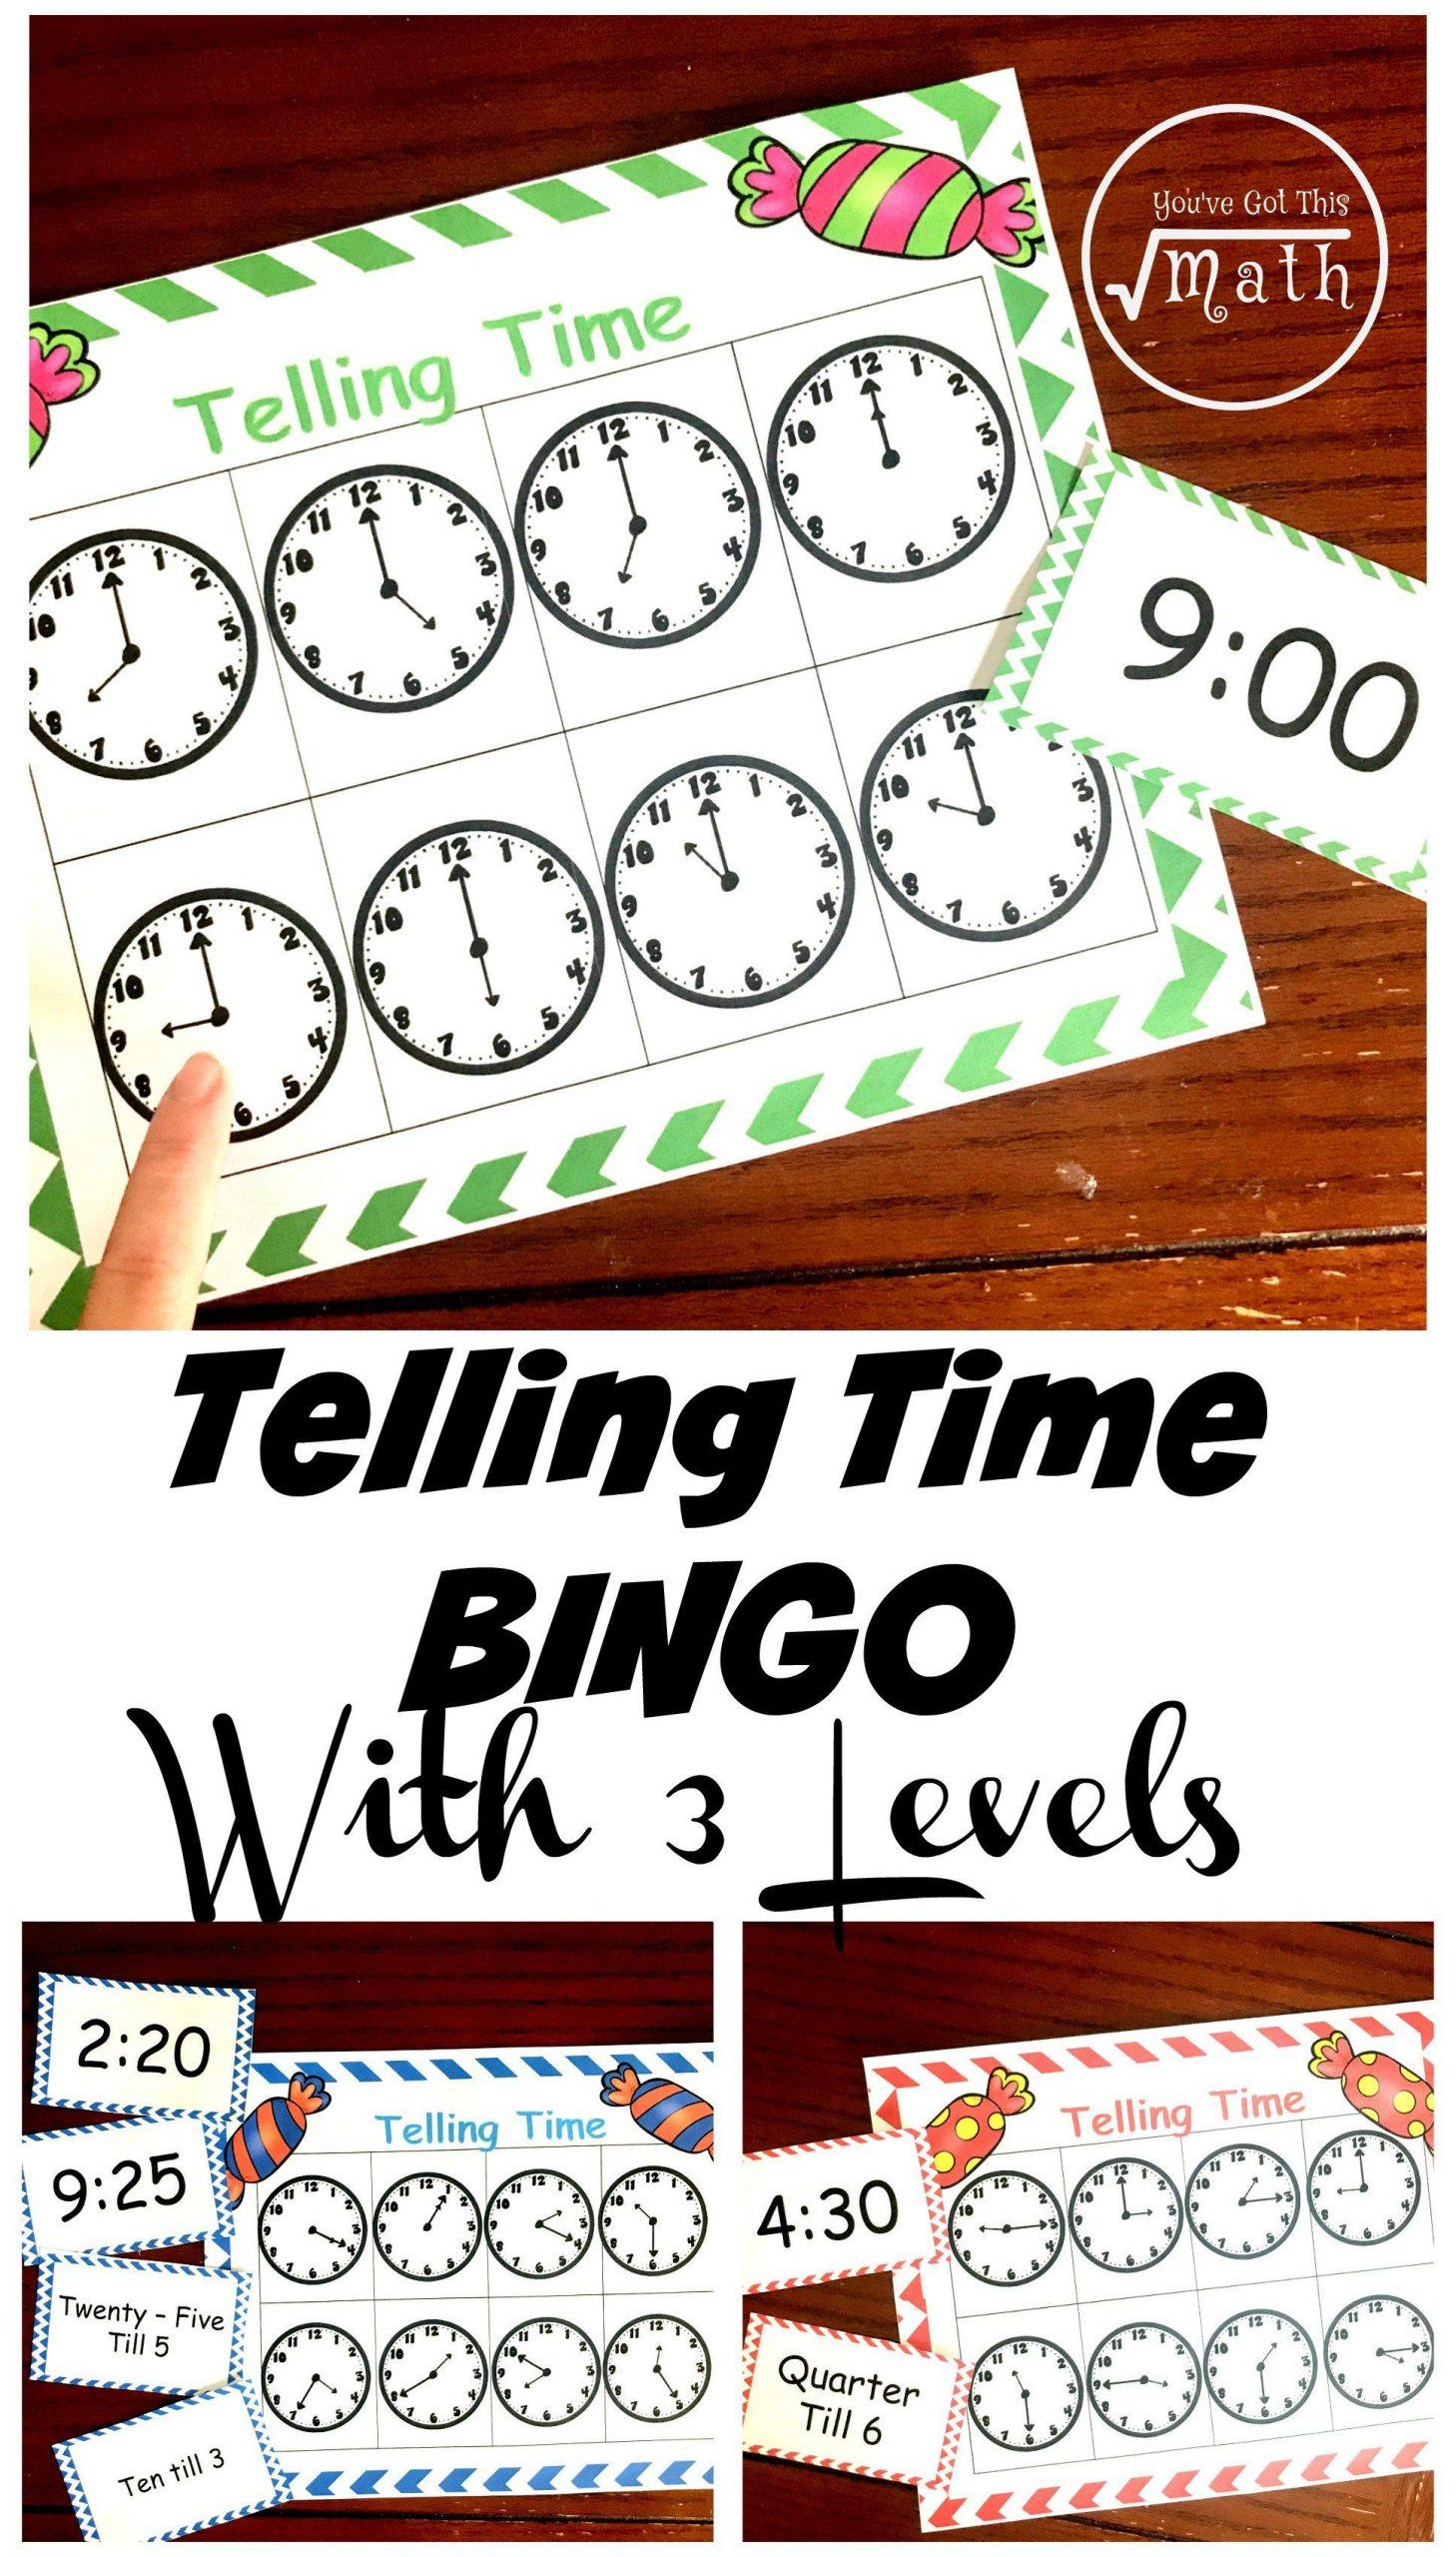 Free Bingo Game To Practice Telling Time For Kids | Telling